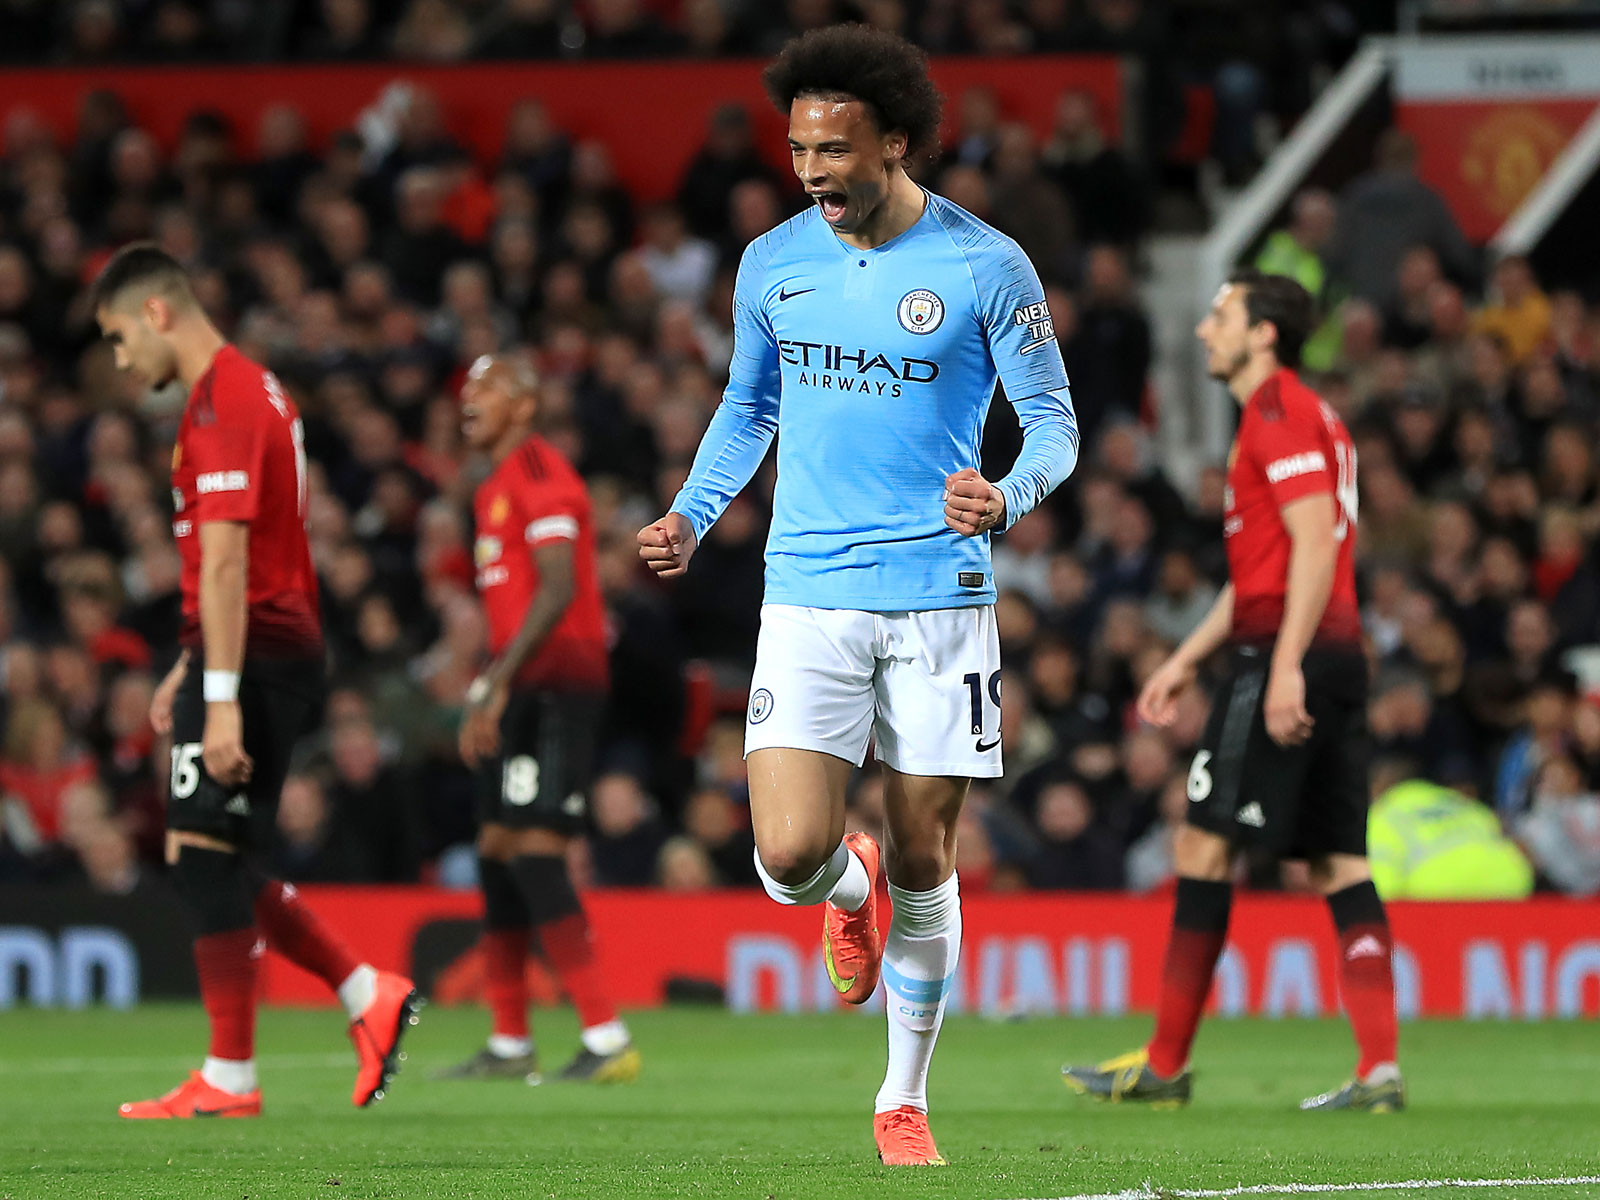 Leroy Sane scores for Man City vs. Man United